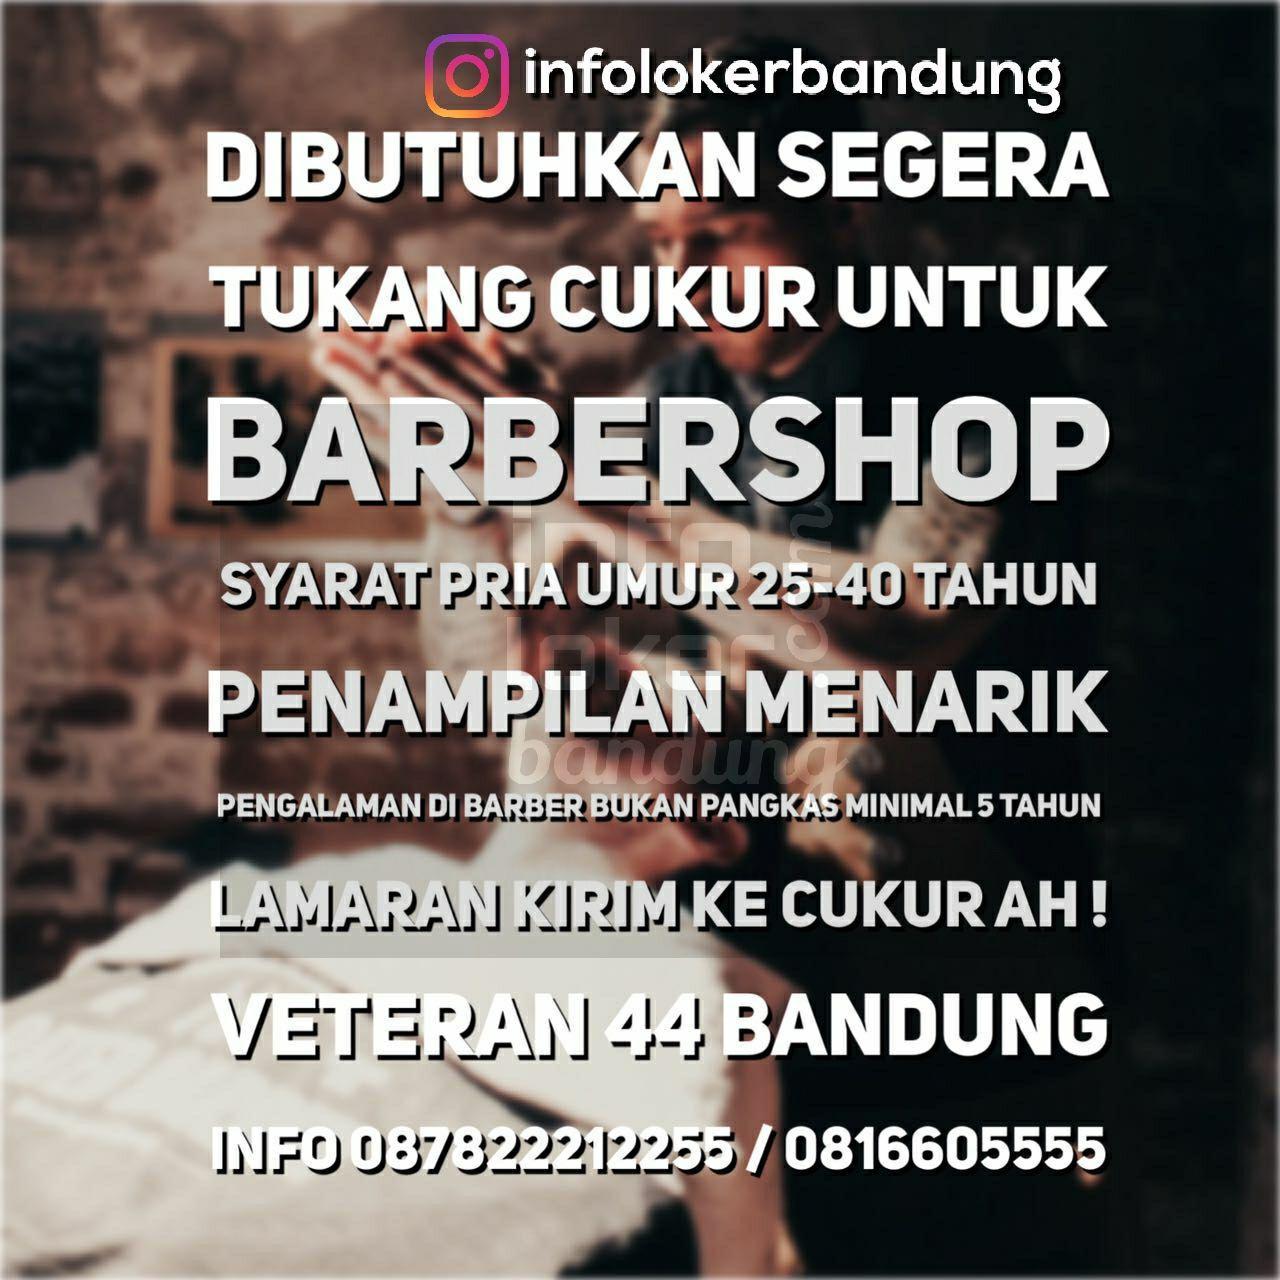 Lowongan Kerja Barbershop Cukur Ah Bandung September 2017